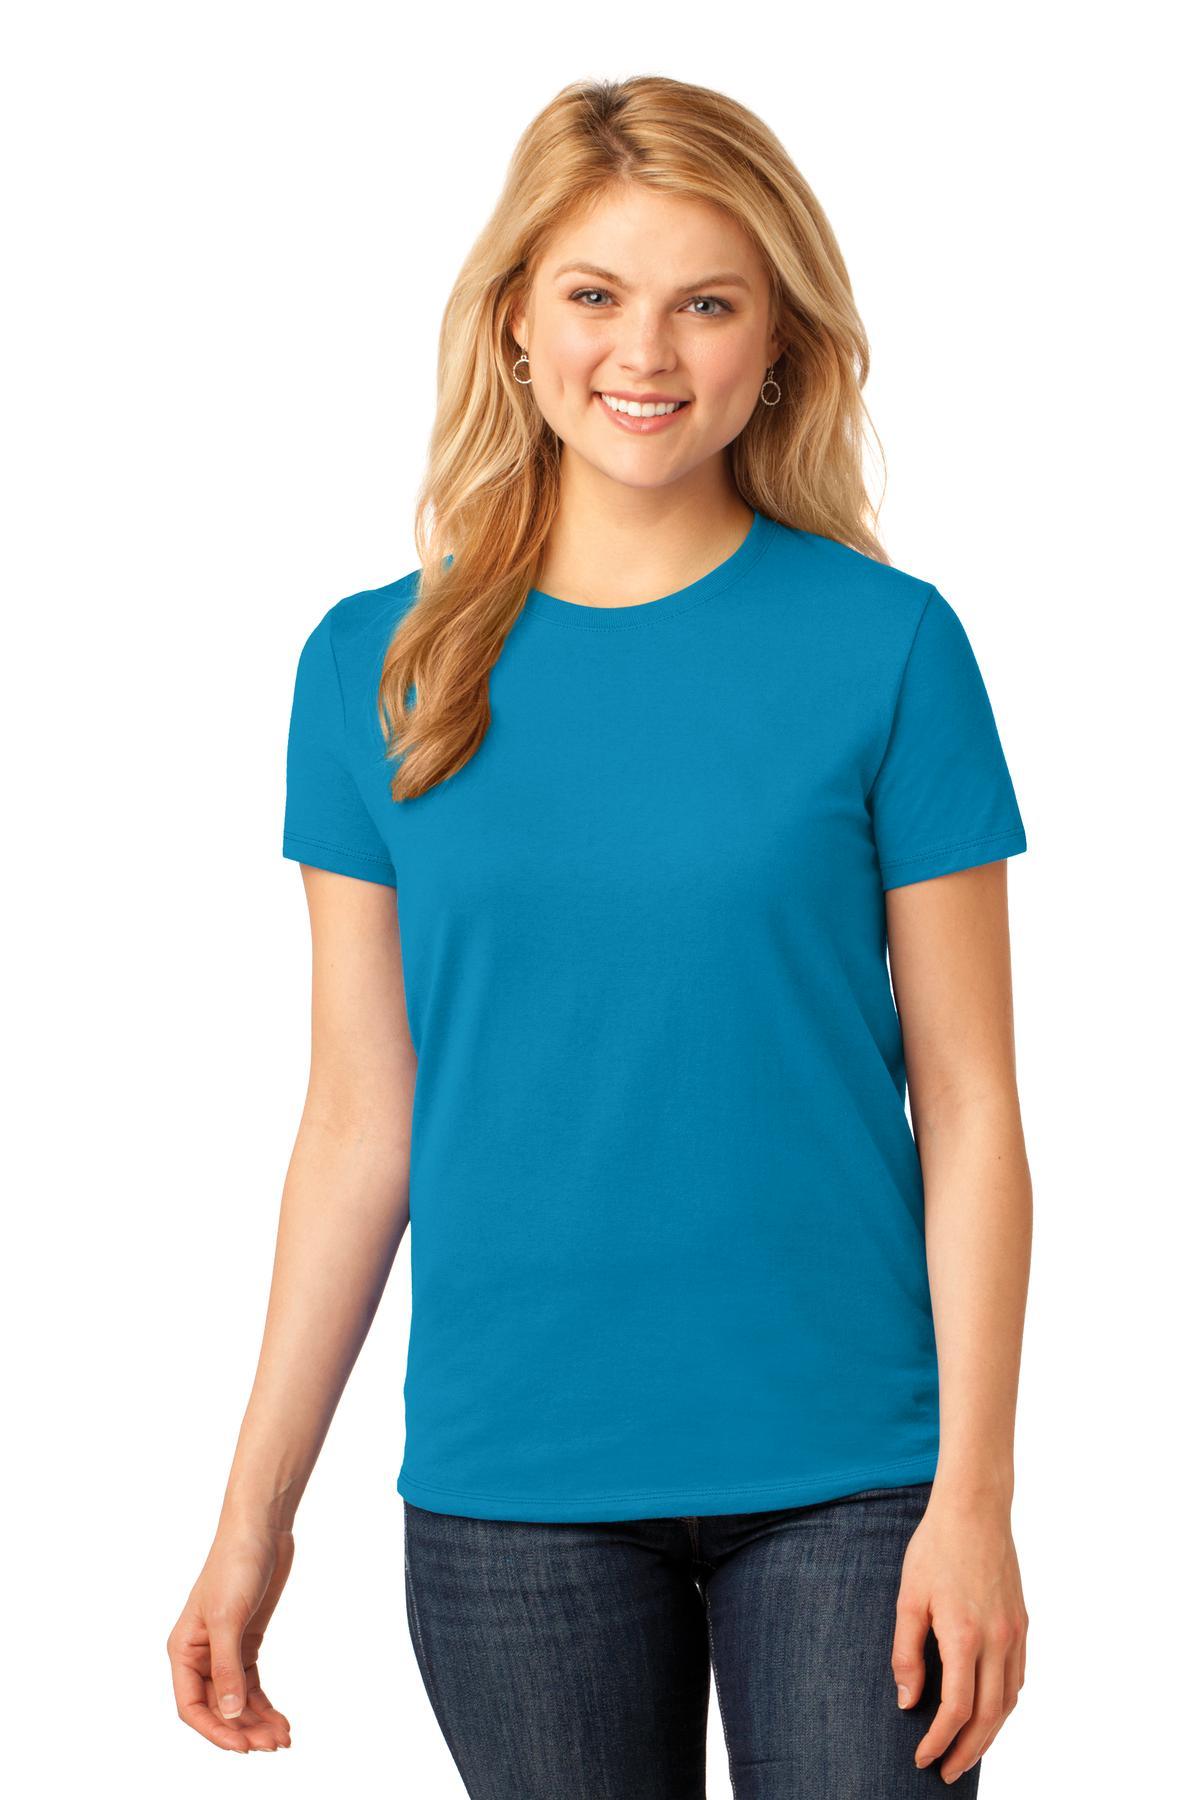 T-Shirts-100-Cotton-79